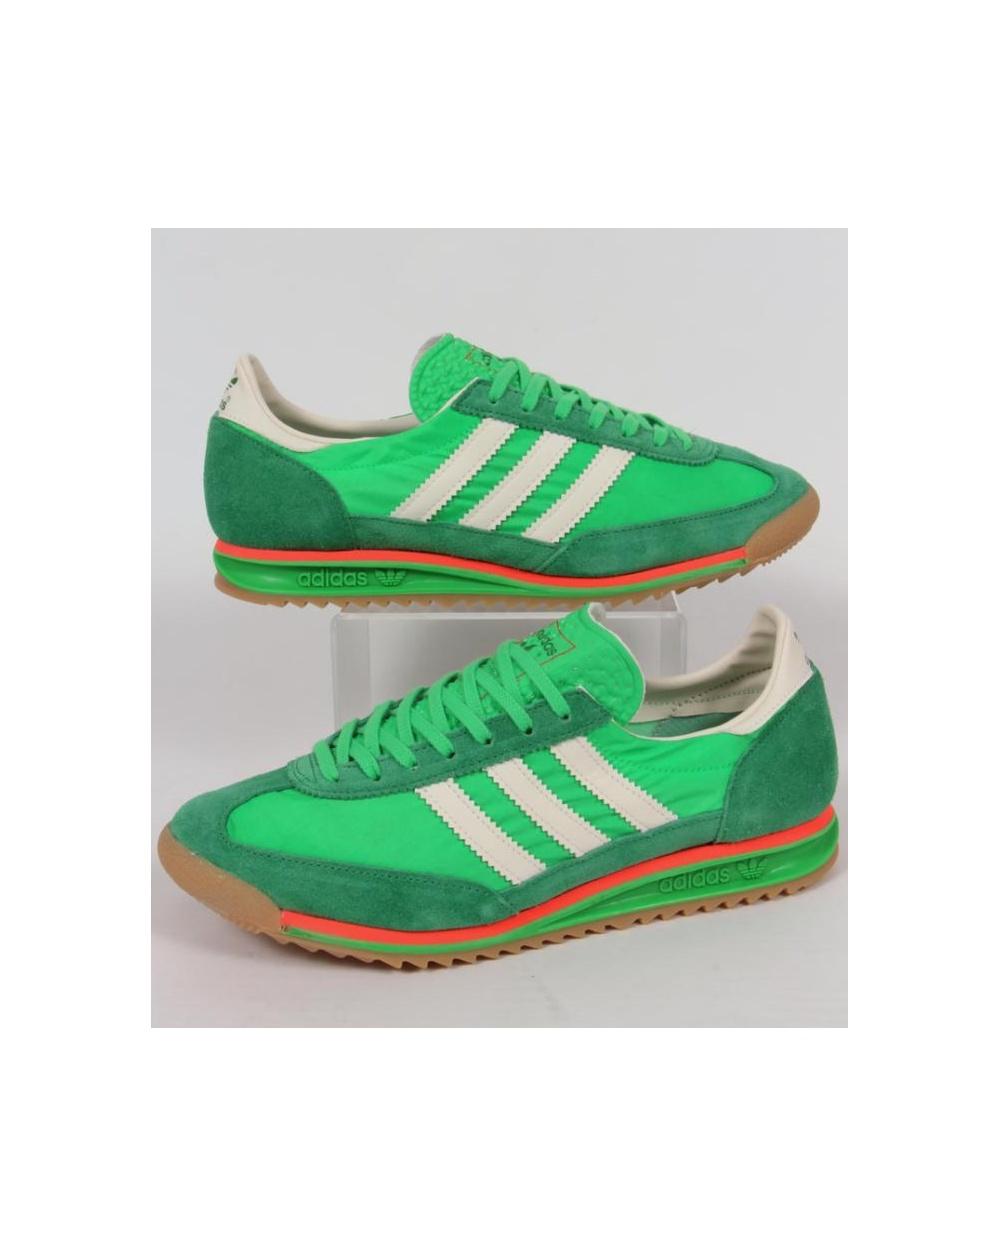 sale retailer 1bca3 fbe18 adidas Trainers Adidas SL 72 Trainers Flash Green White